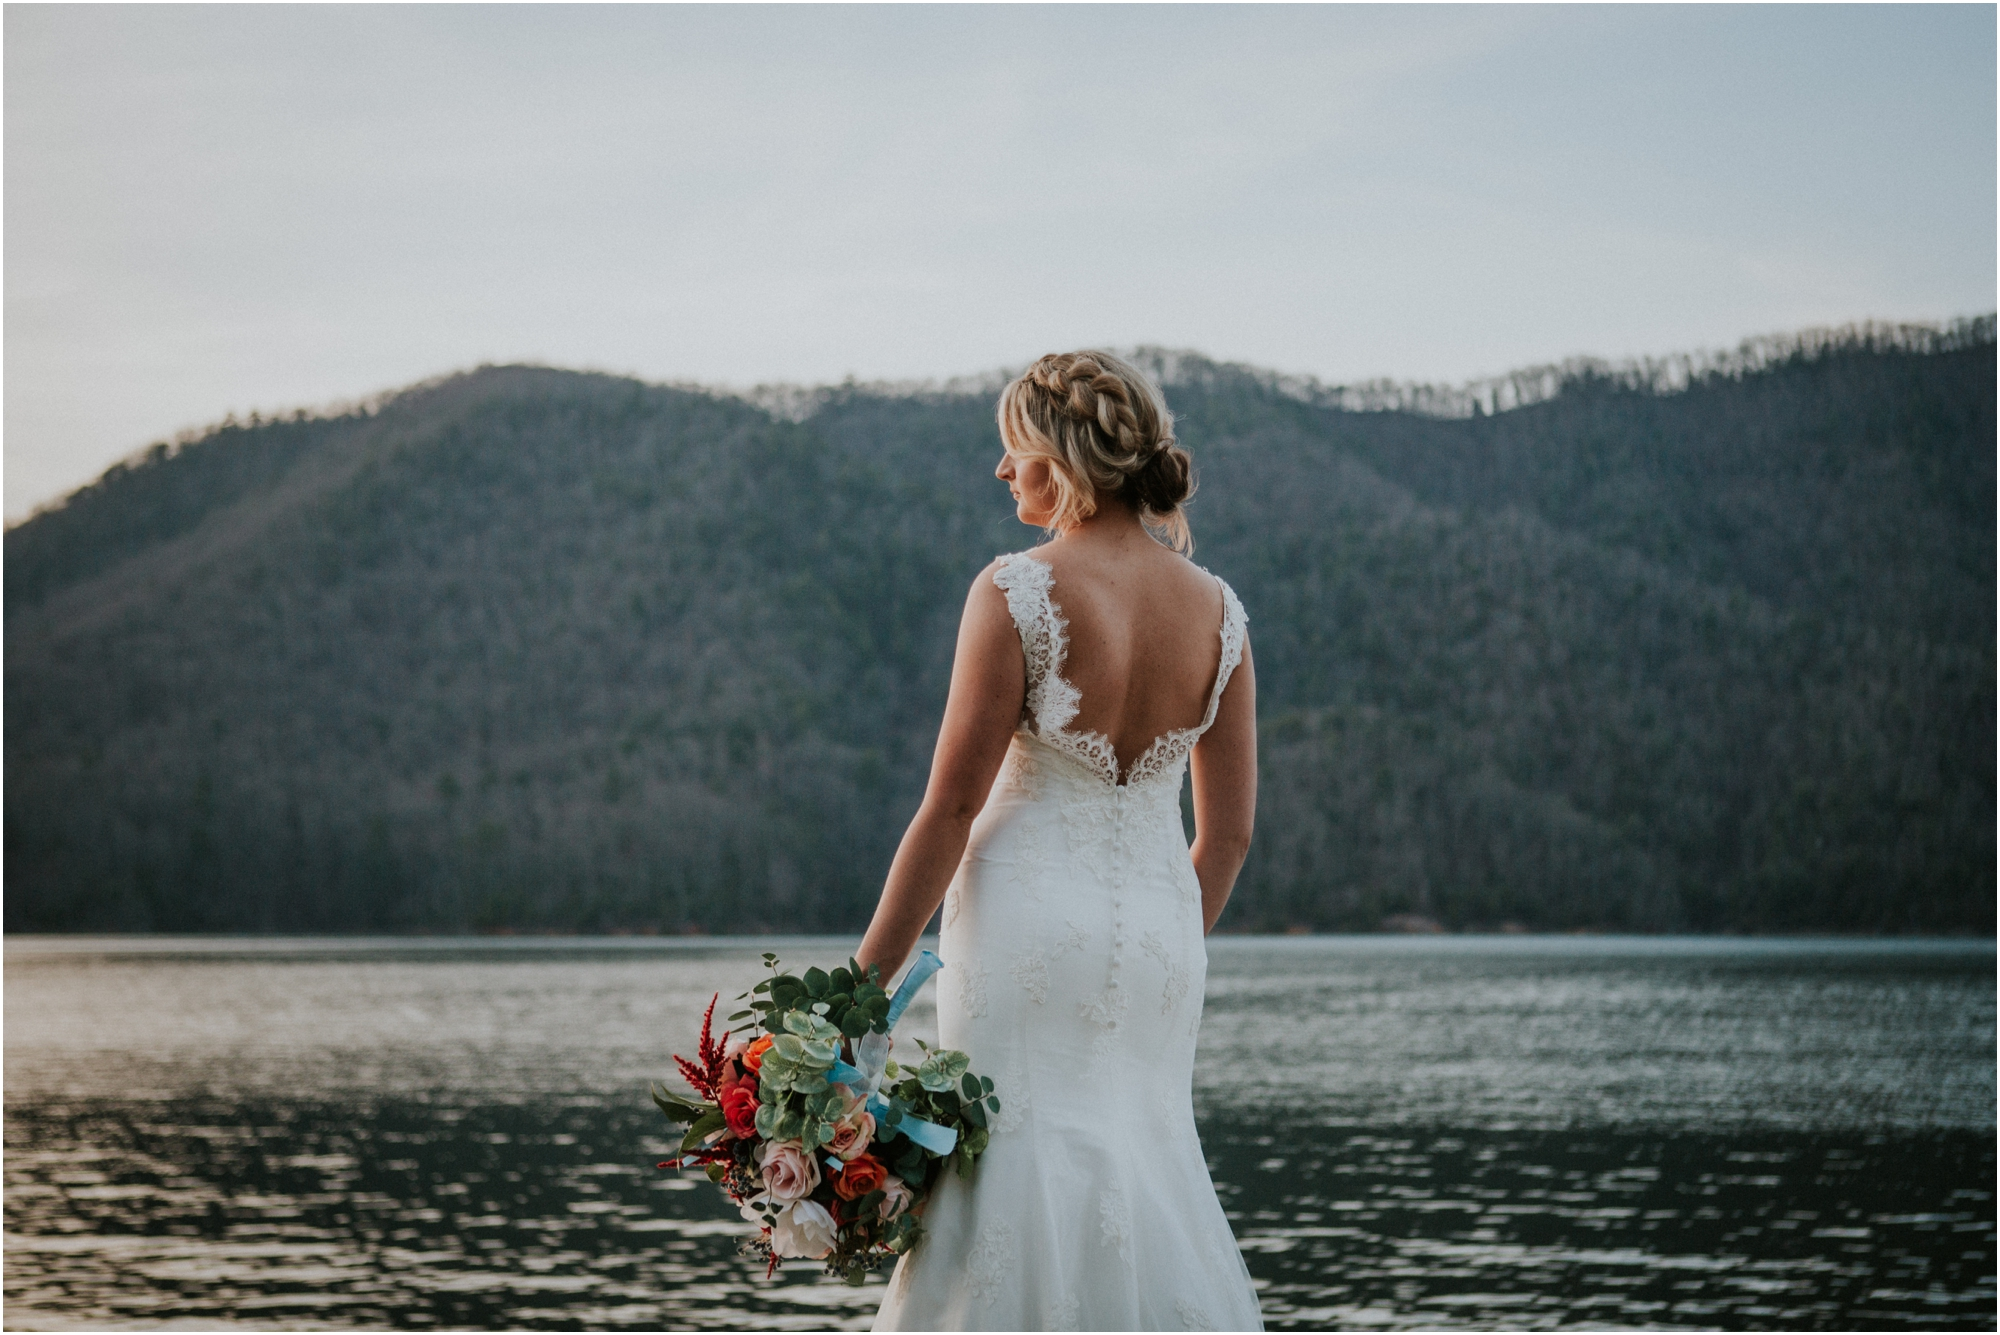 watauga-lake--bohemian-bridal-styled-session-northeast-tennessee-wedding-elopement-photography_0014.jpg